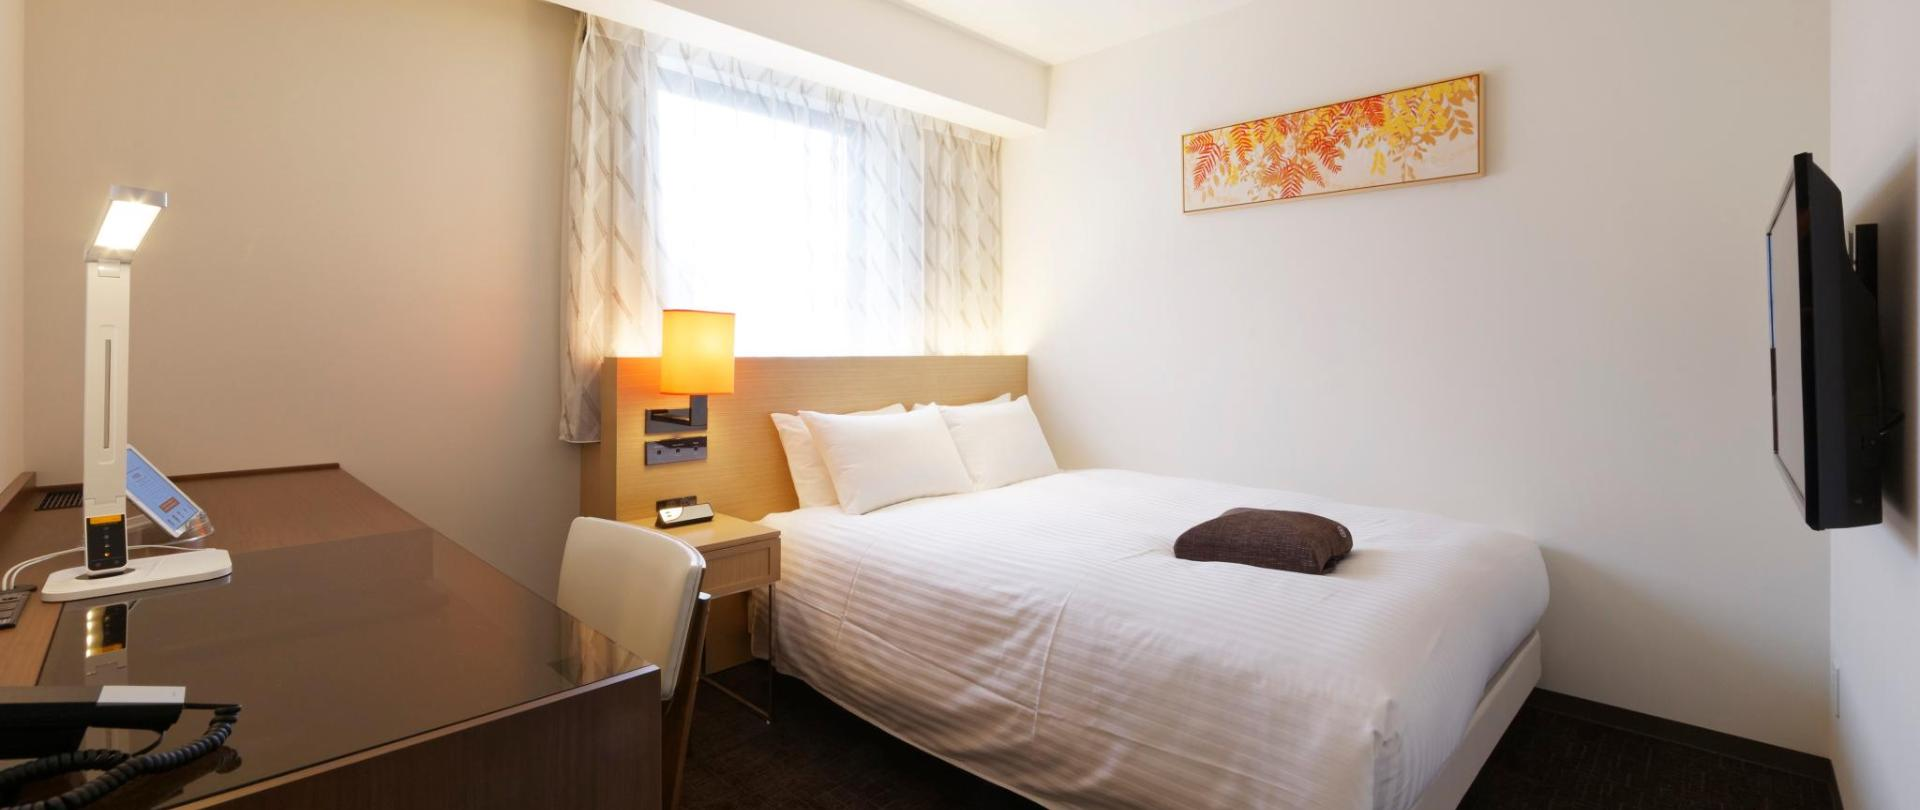 酒店極限競速Hakataeki Hakataguchi